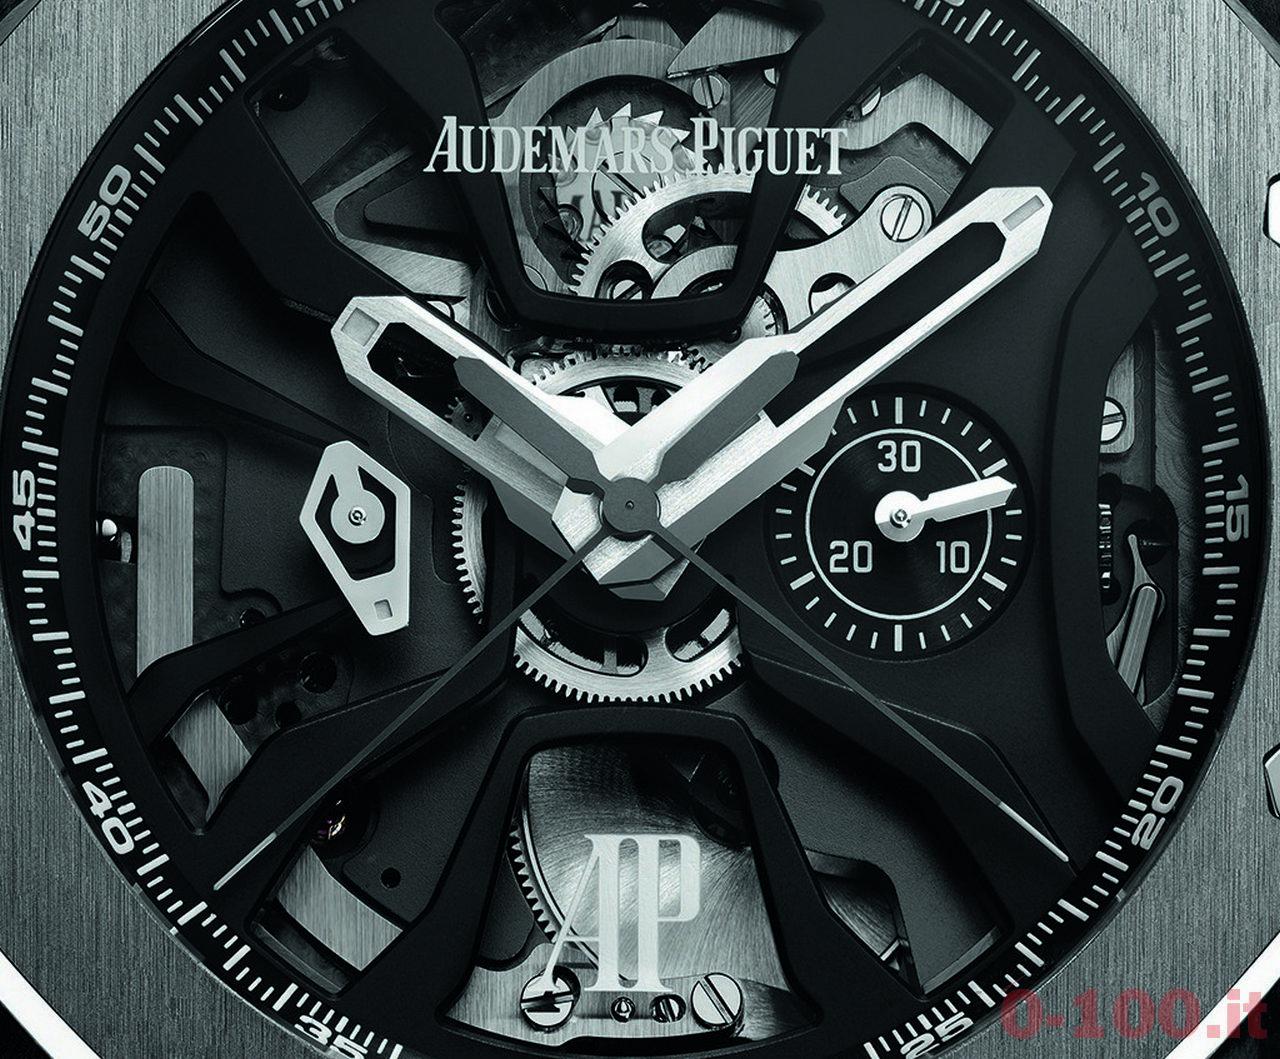 audemars-piguet-royal-oak-concept-laptimer-michael-schumacher-limited-edition-ref-26221ft-oo-d002ca-01_0-1001